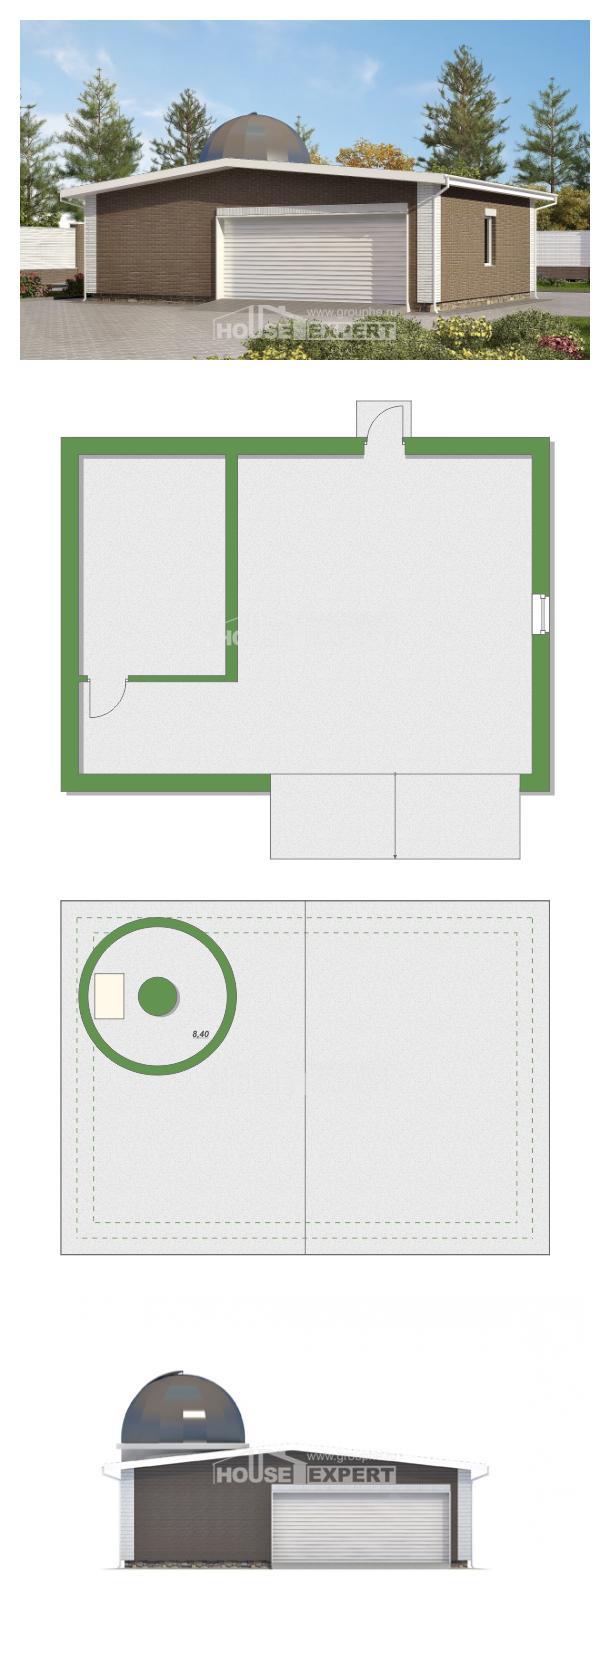 Projekt domu 075-001-R | House Expert